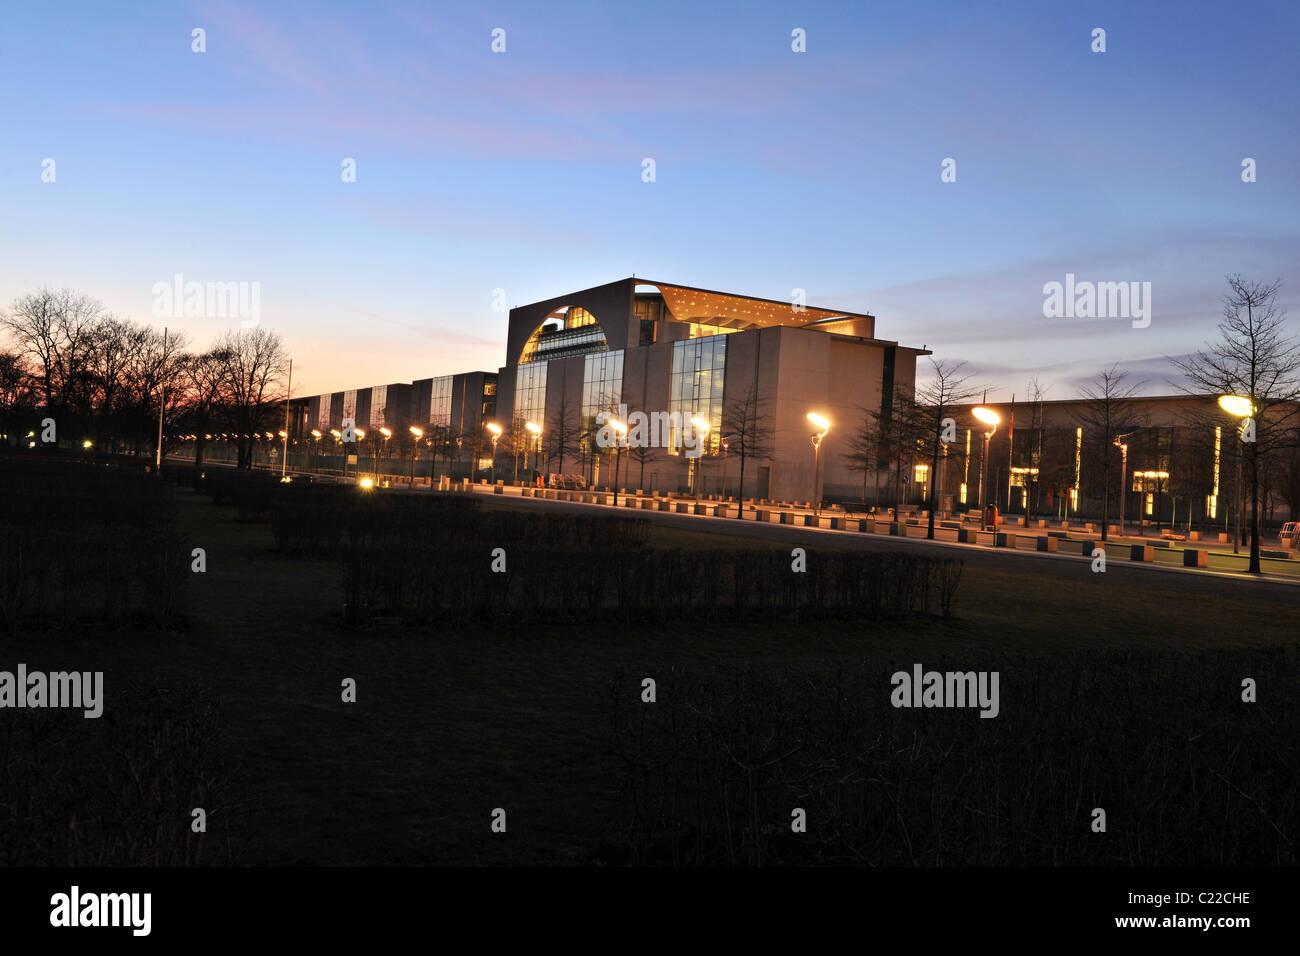 Kanzleramt, German Chancellery, at night, Berlin, Germany, Europe - Stock Image